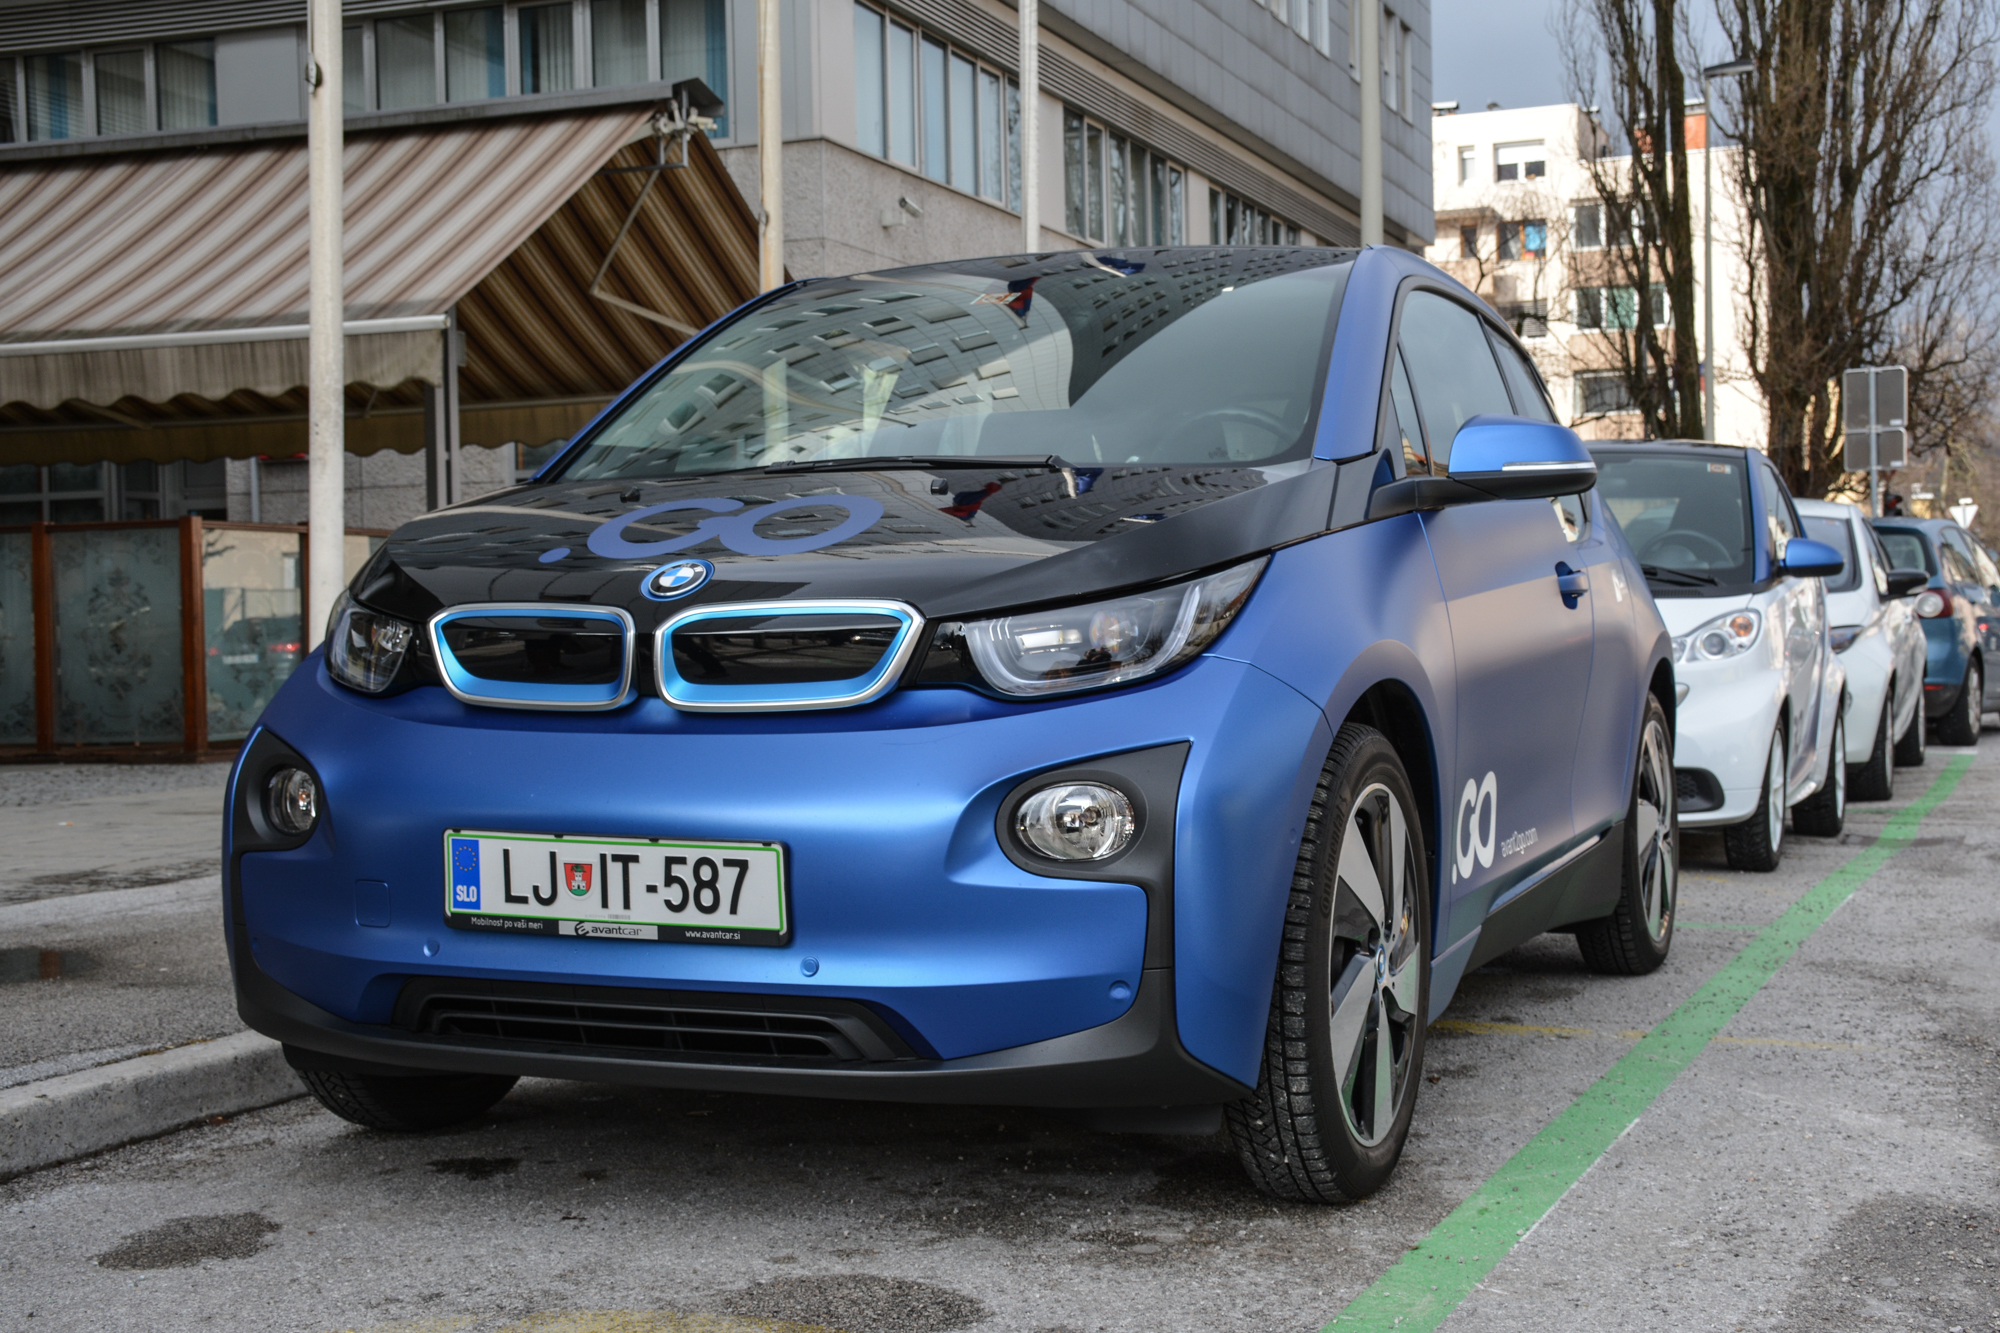 Avant2Go car sharing državna uprava